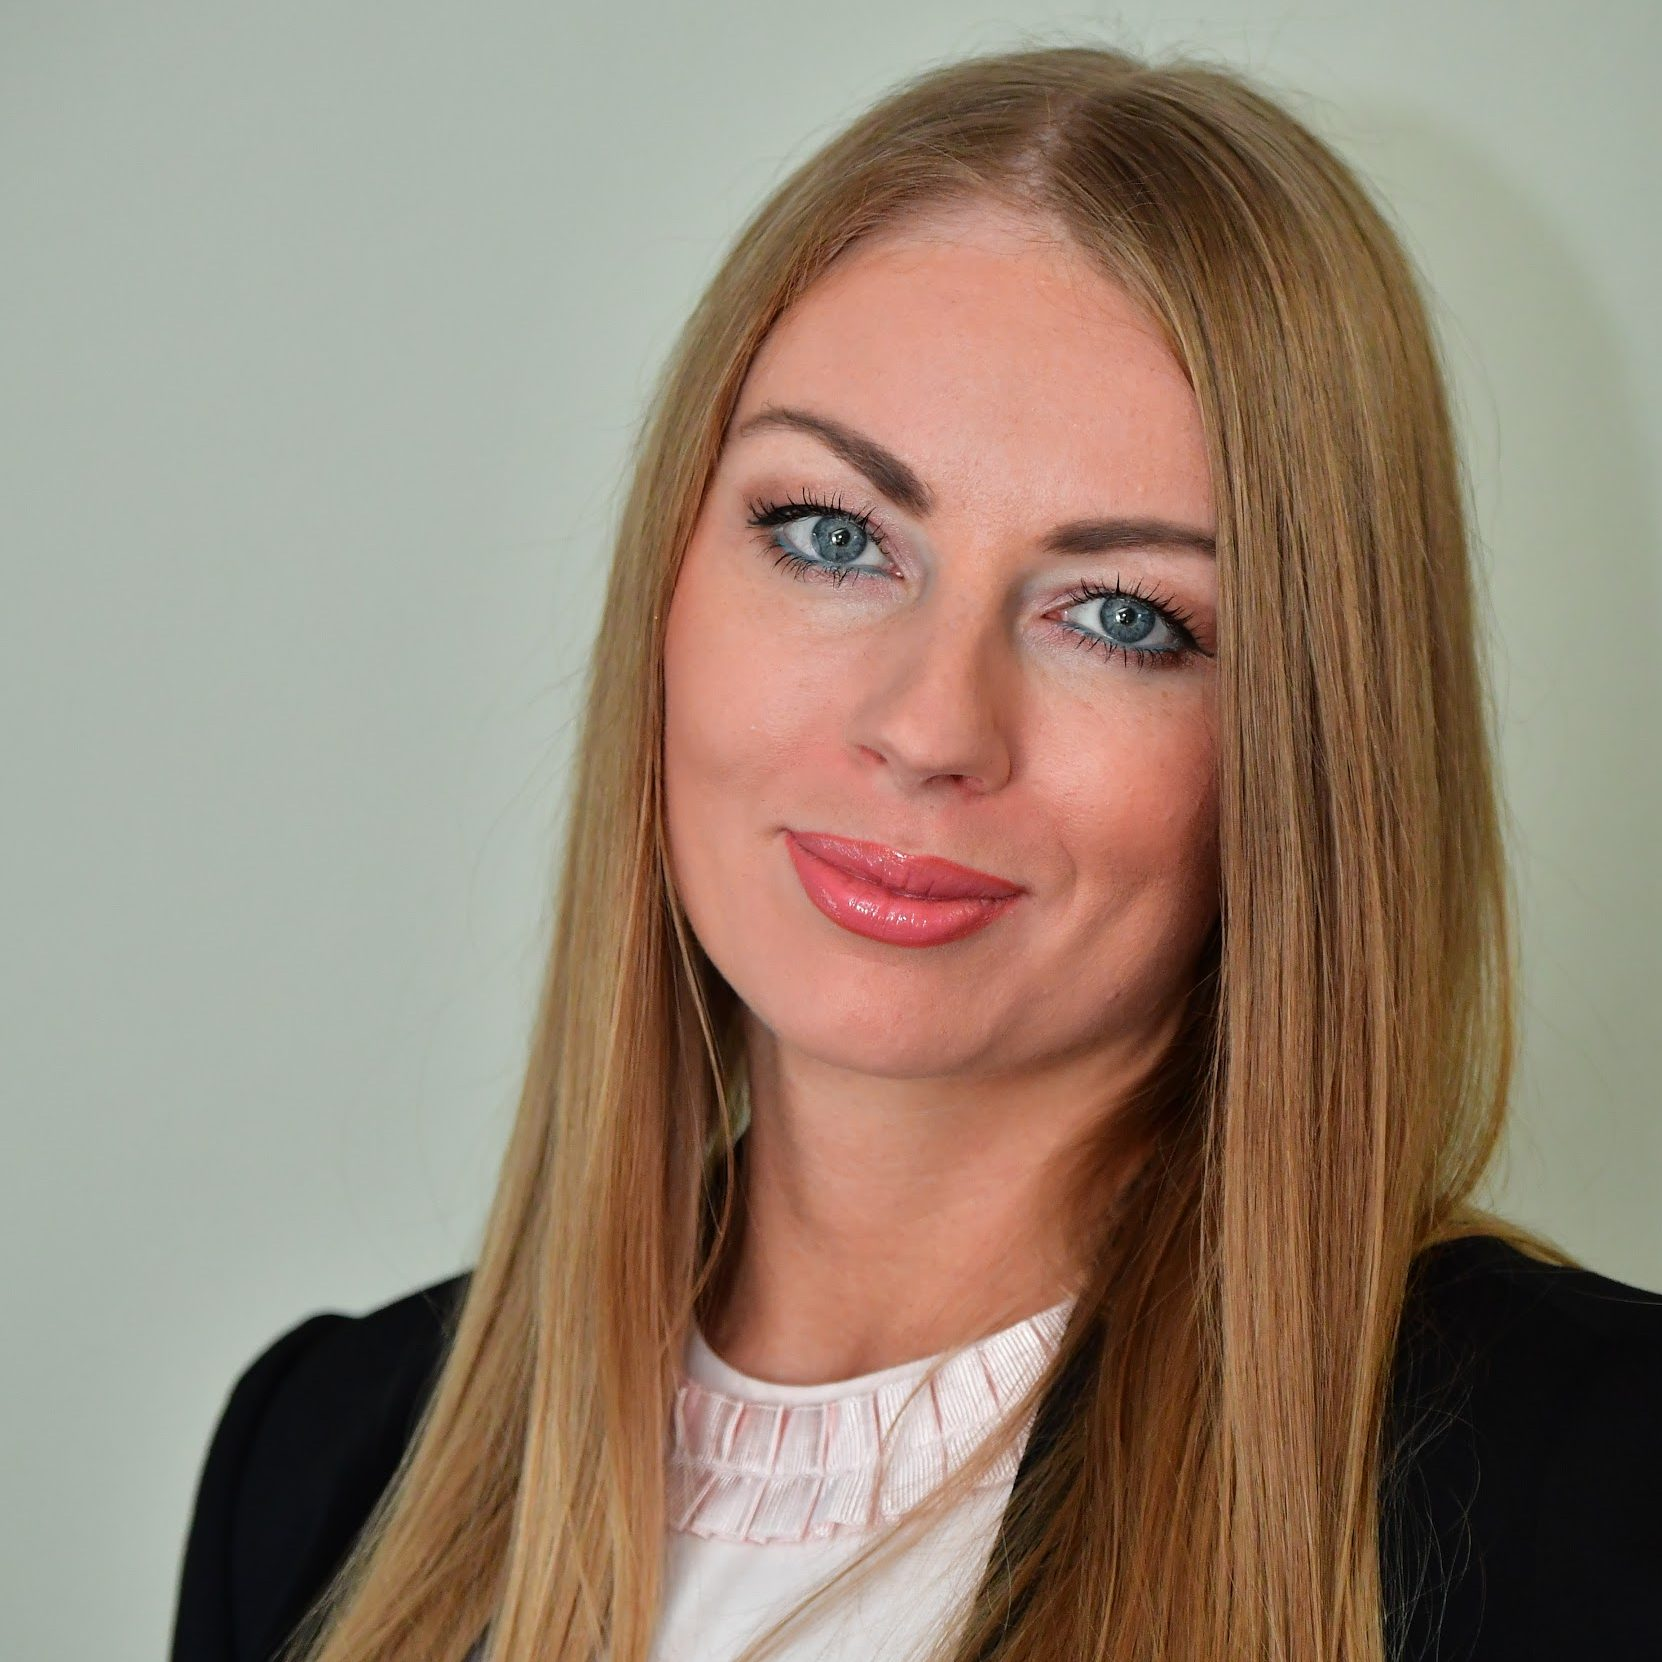 Ksenia Yudina, U-Nest Holdings LLC - financial goals - Tips from the Pros